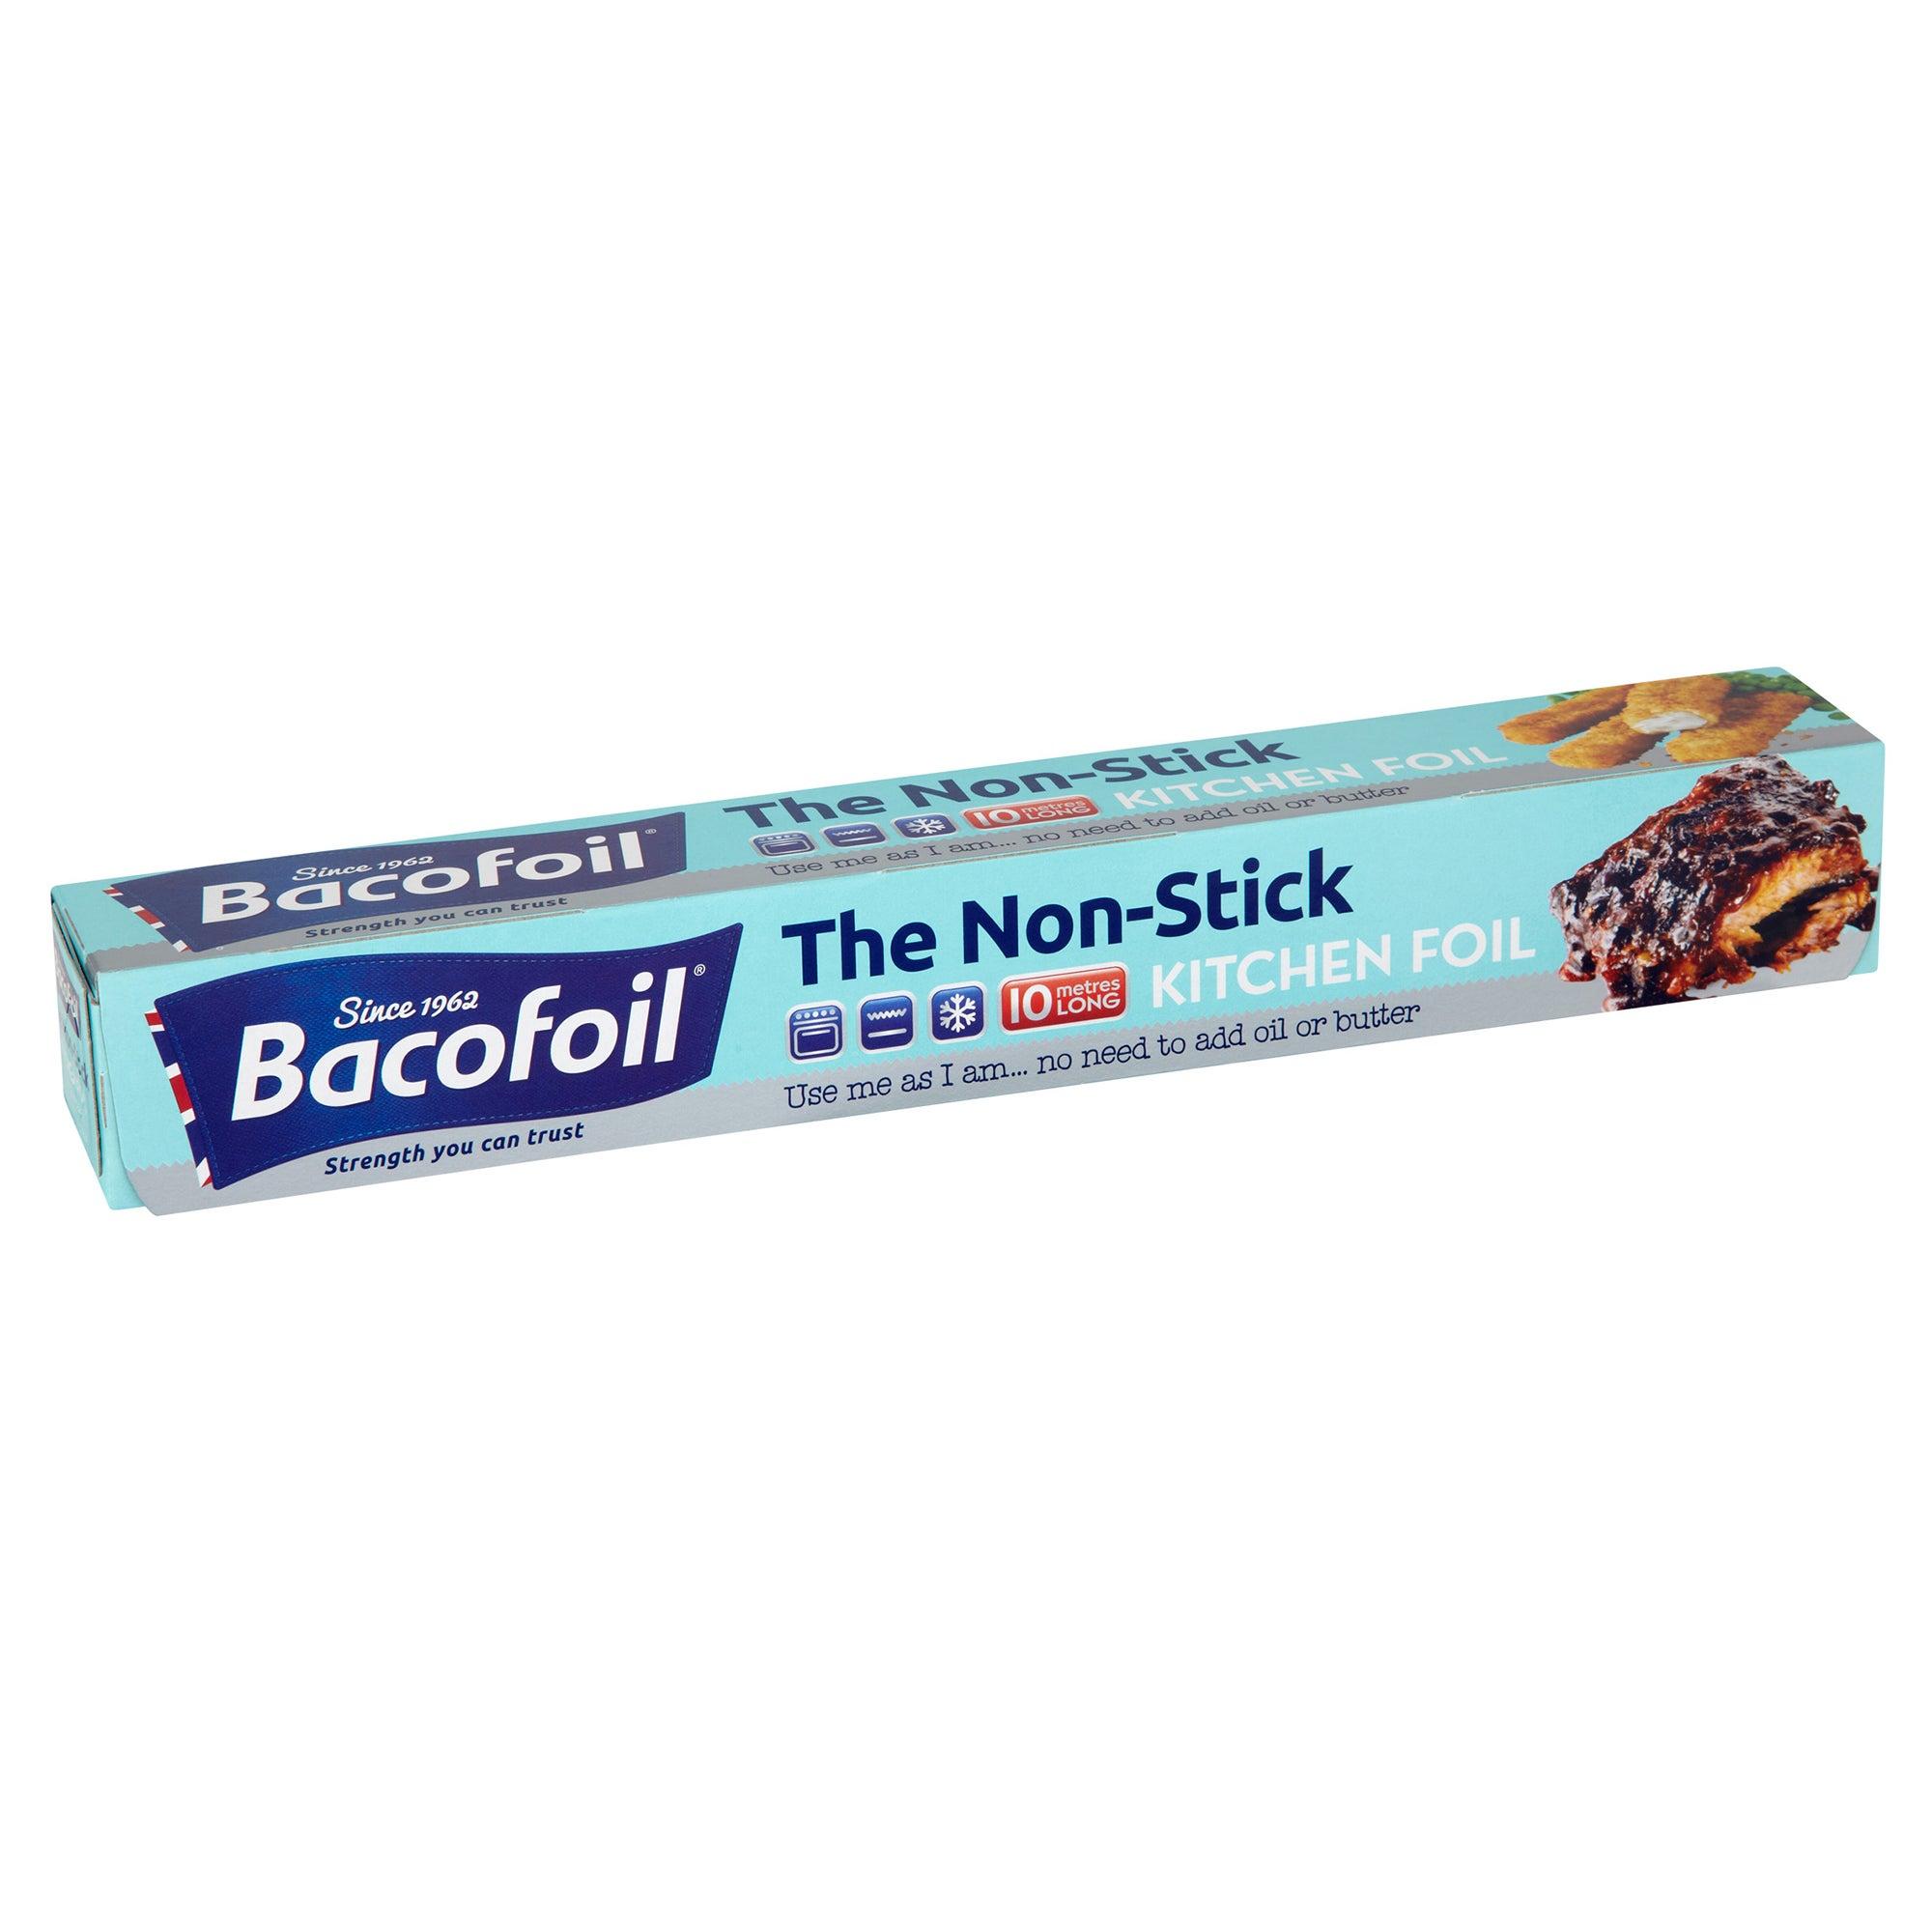 BacoFoil Non Stick Foil